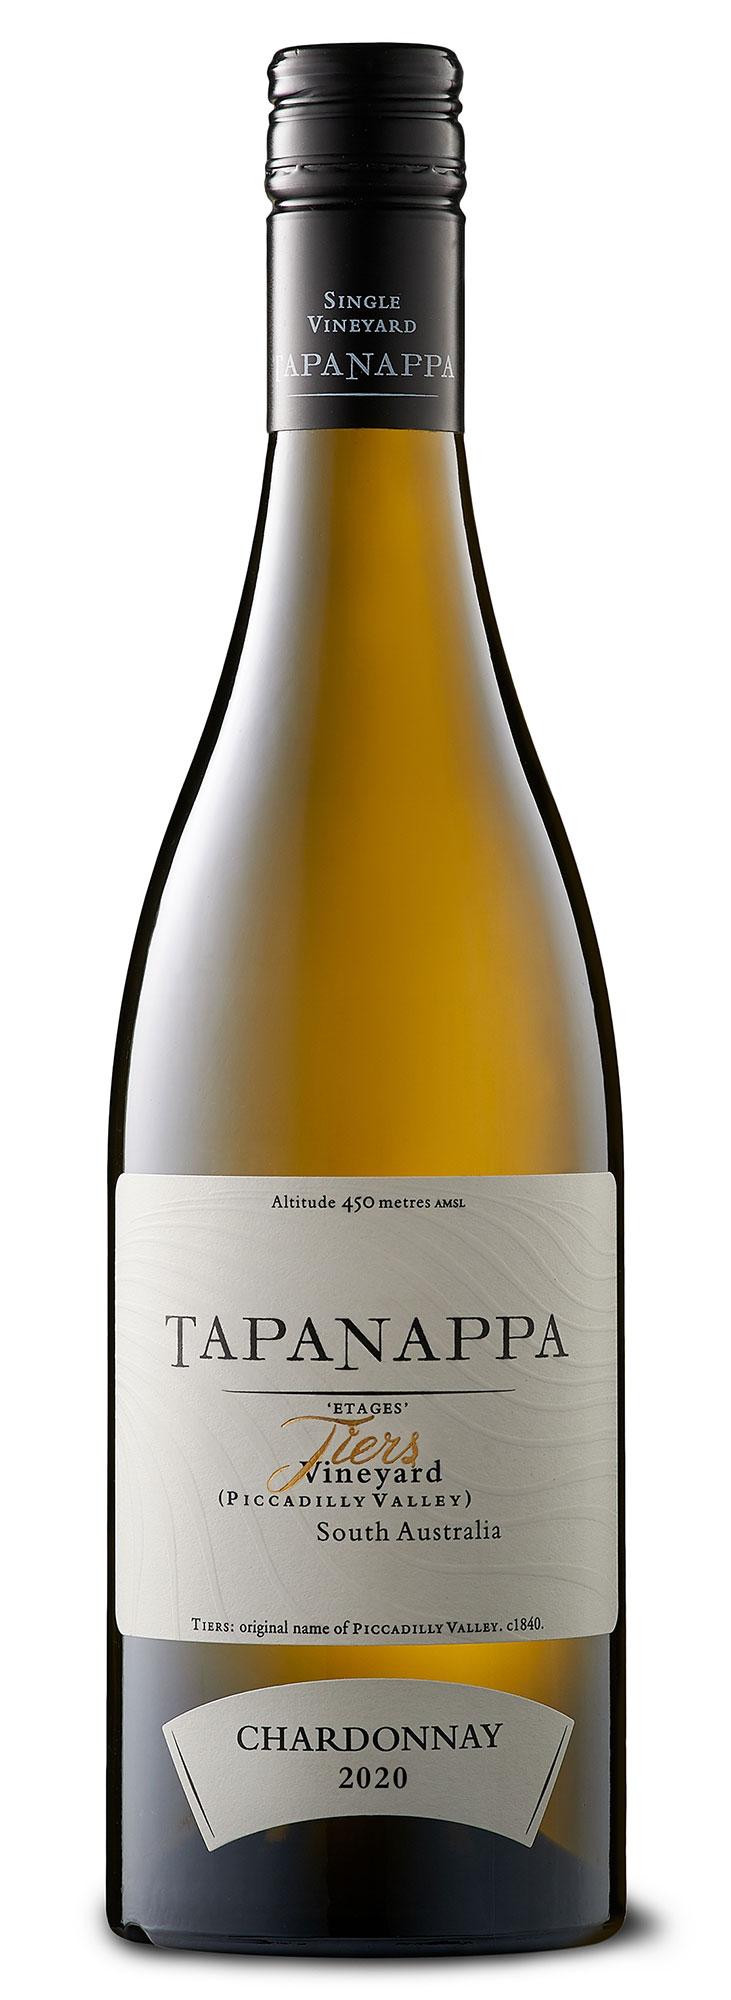 Tapanappa Tiers Vineyard 2020 Chardonnay